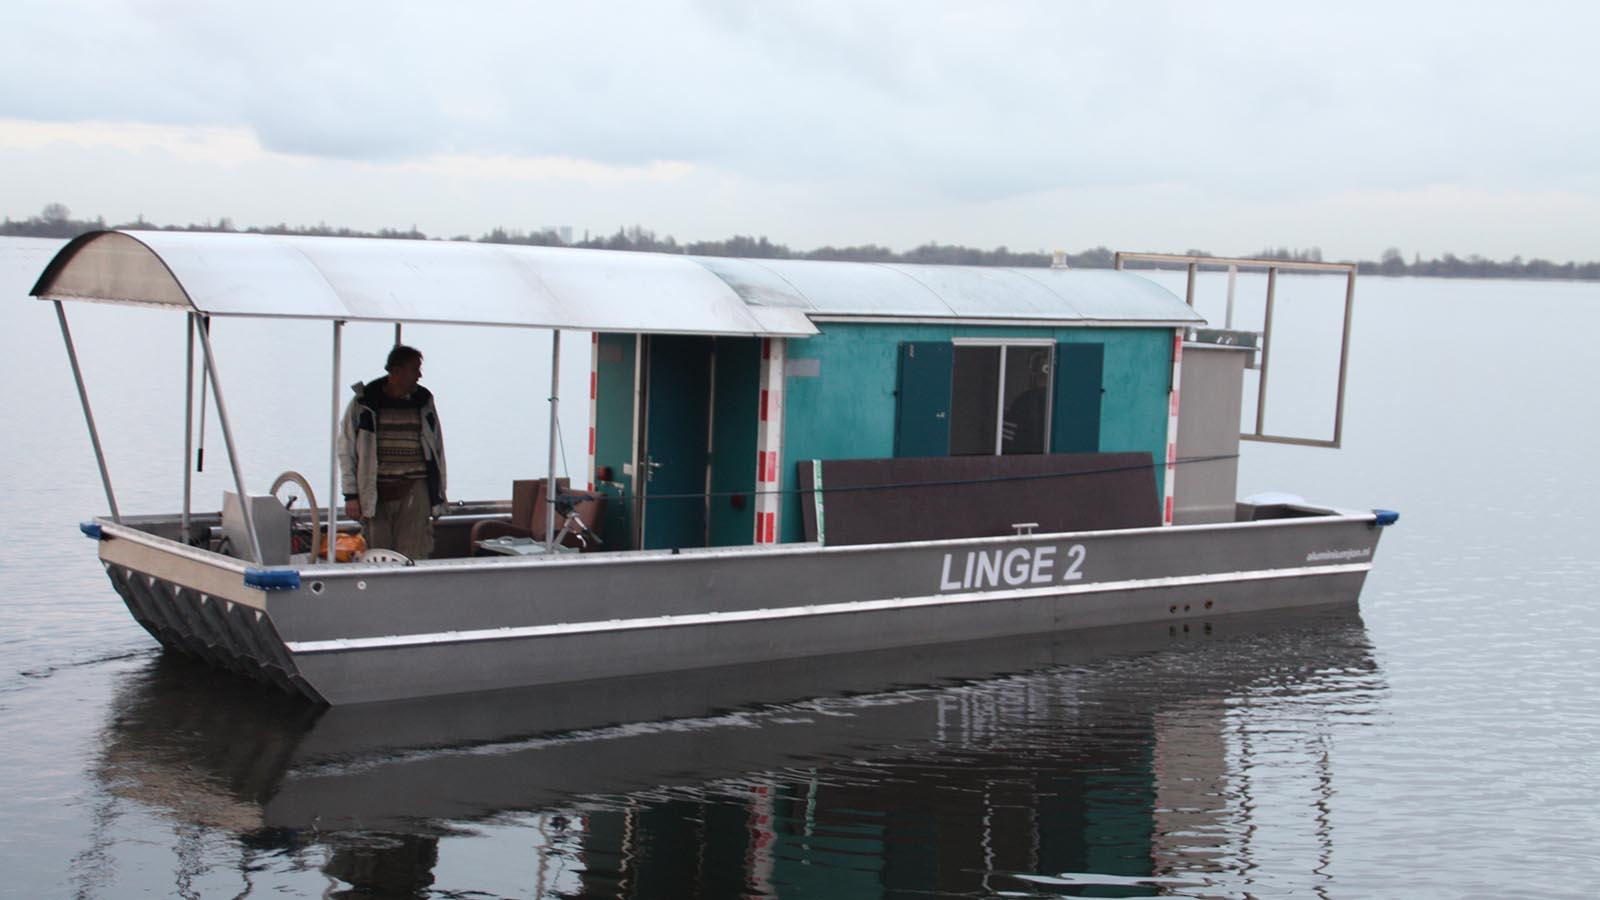 AluminiumJon.nl-Ponton 8 meter-with Yamaha outboard engine-Custom build aluminum pontoons